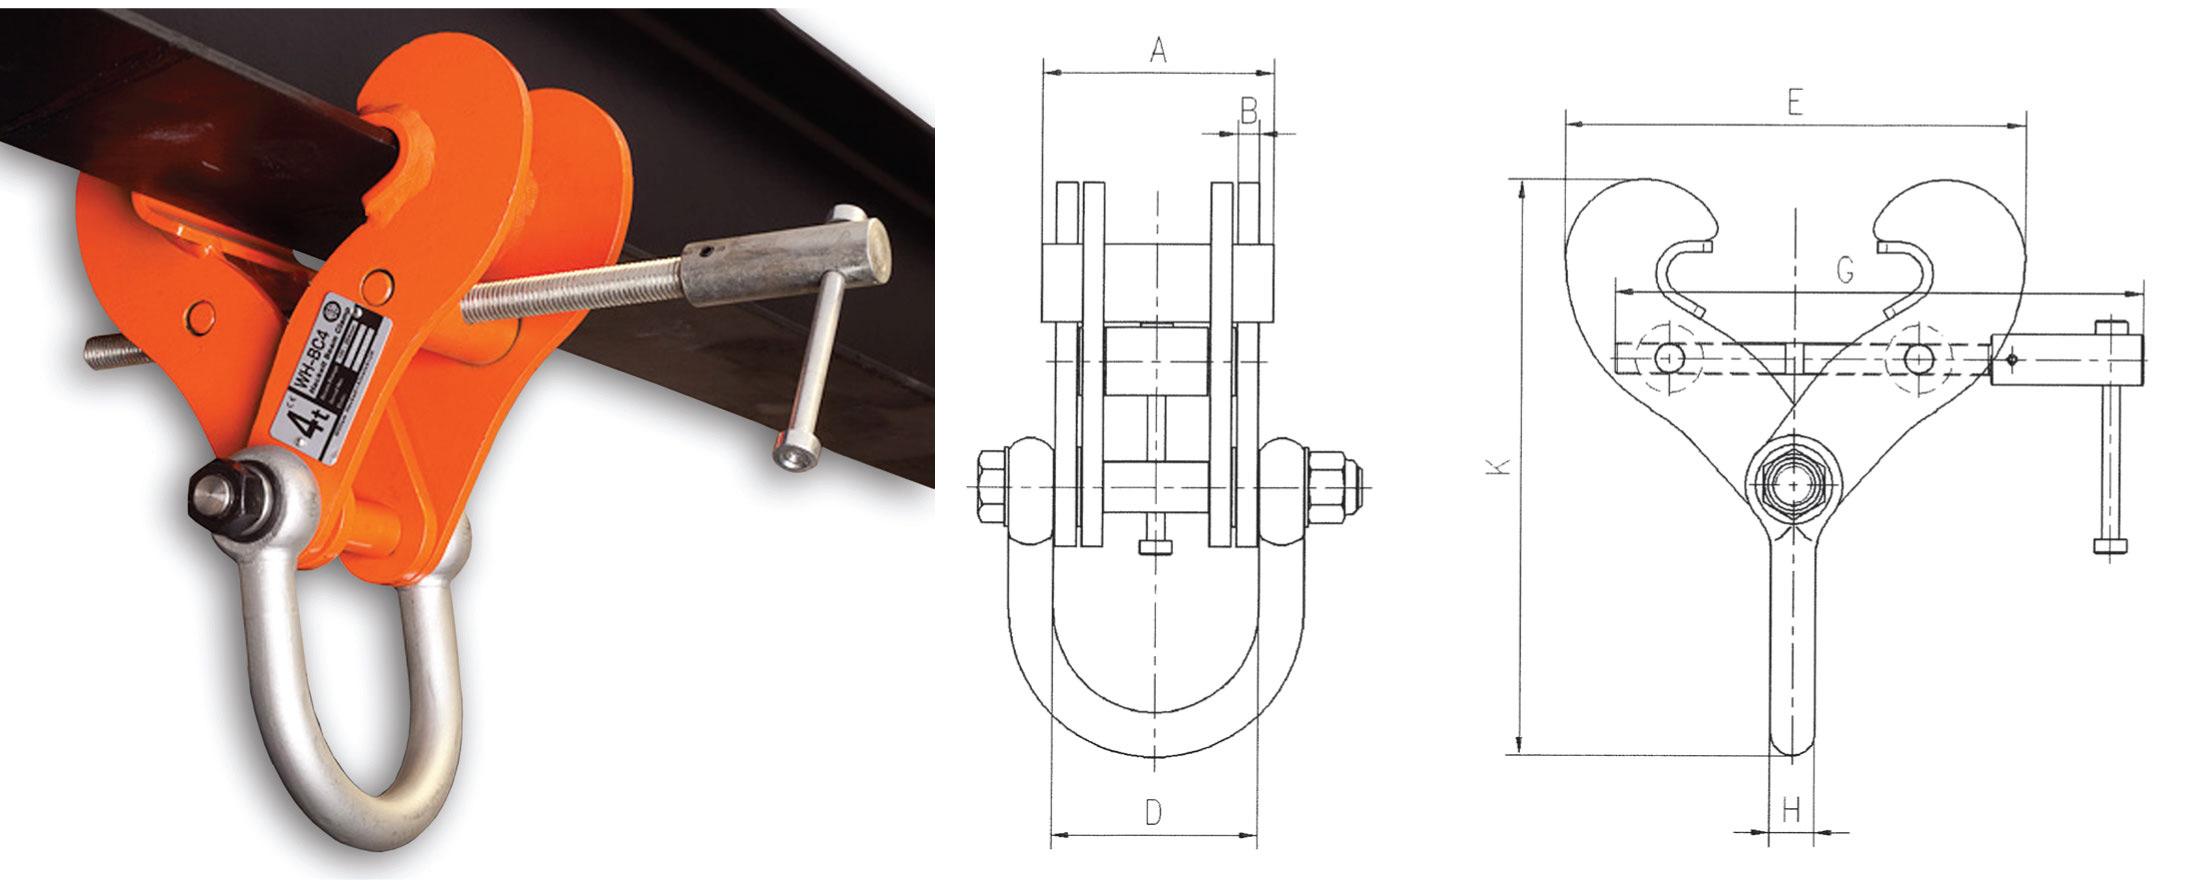 Wh Bc Fixed Jaw Super Clamp Manual Hoisting Lifting